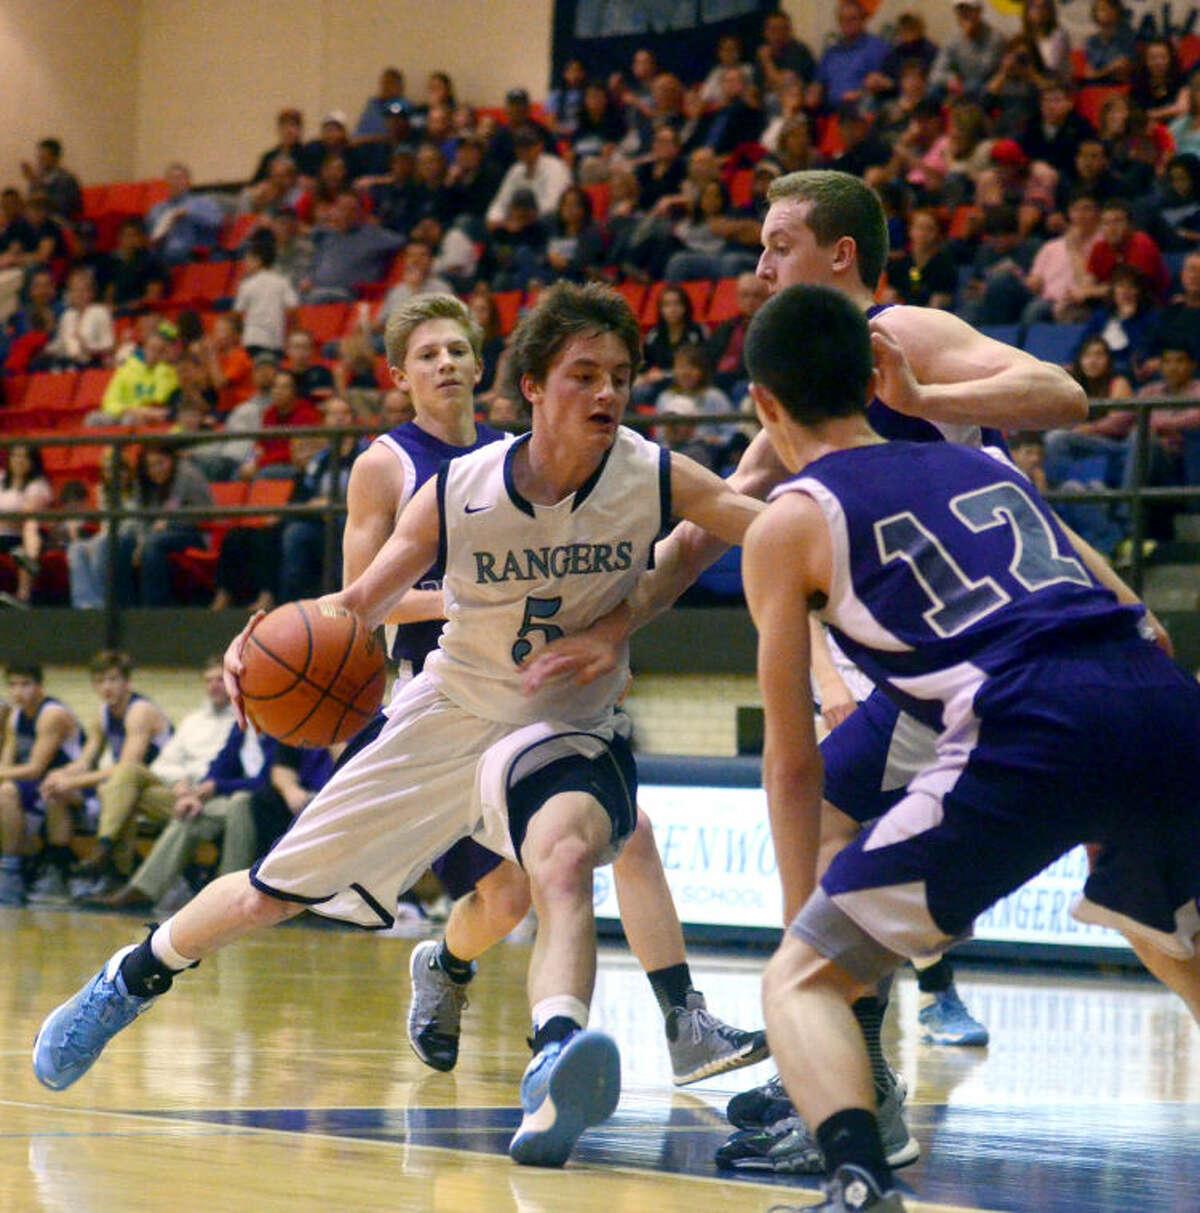 Greenwood's Grant Franklin (5) drives against Abilene Wylie's Zach Erickson (12) and Christian Nichols (24) on Friday at Greenwood High School. James Durbin/Reporter-Telegram